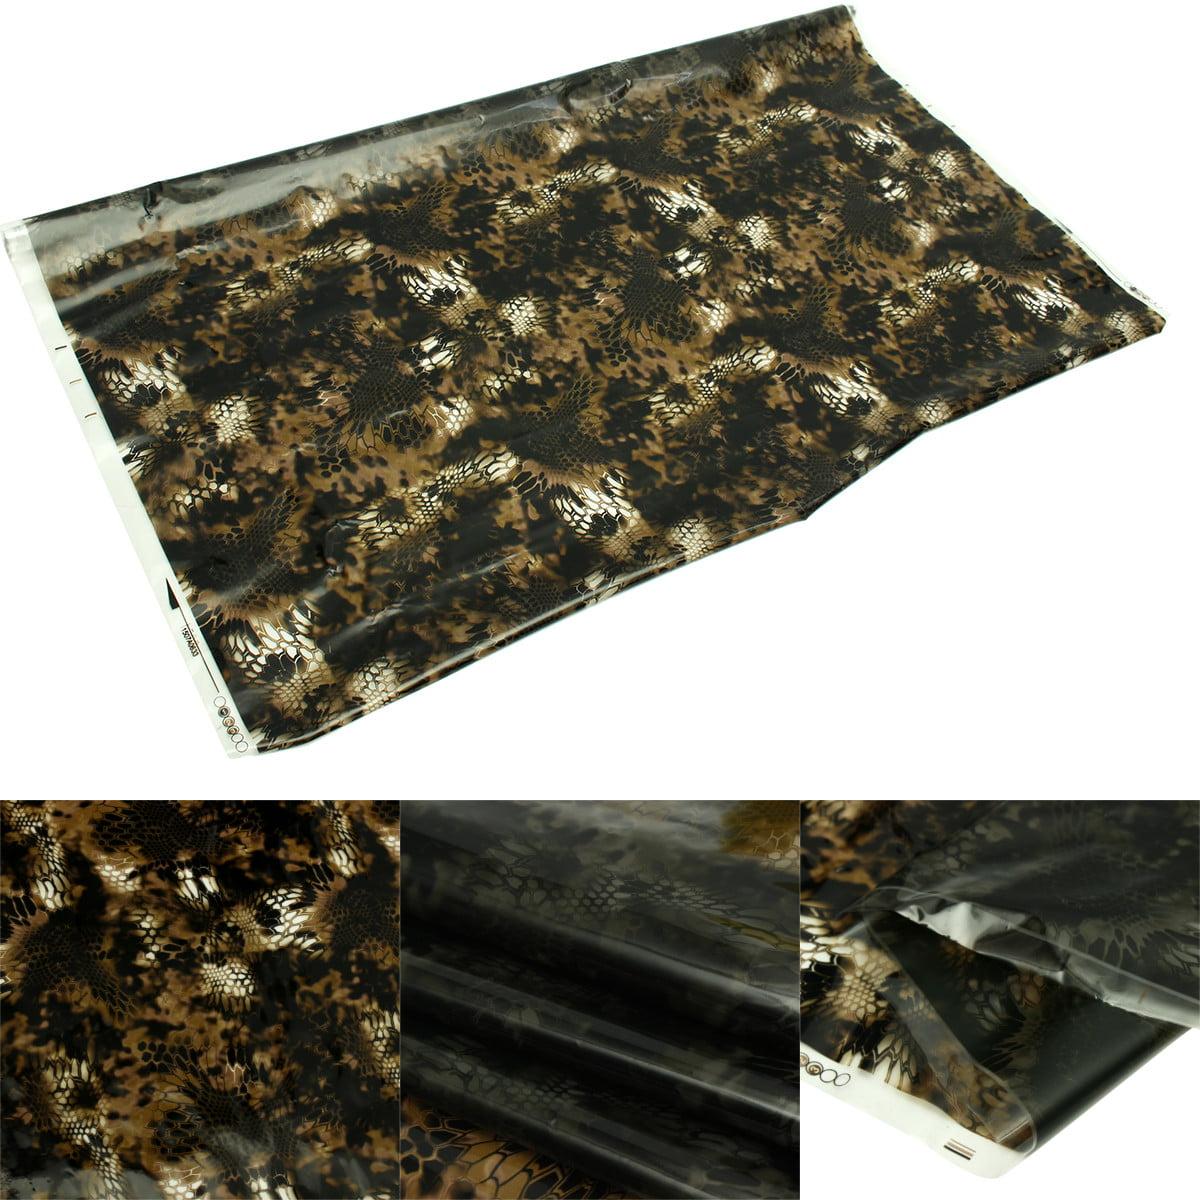 50*200cm Black PVA Hydrographic Water Transfer Dipping Hydro Printing Film